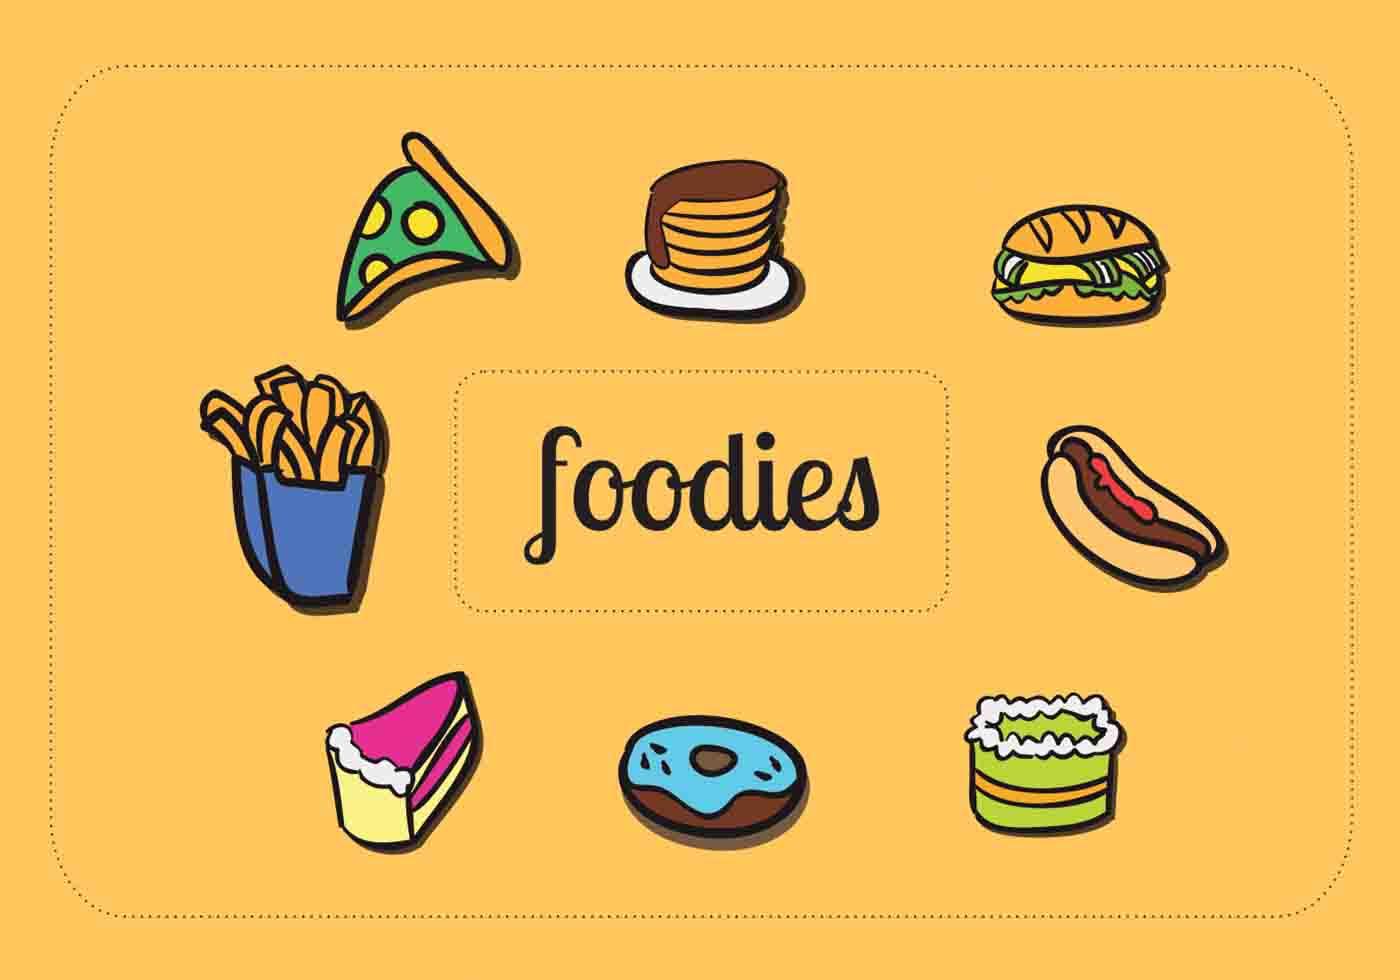 Creative Food Vectors Download Free Vector Art Stock